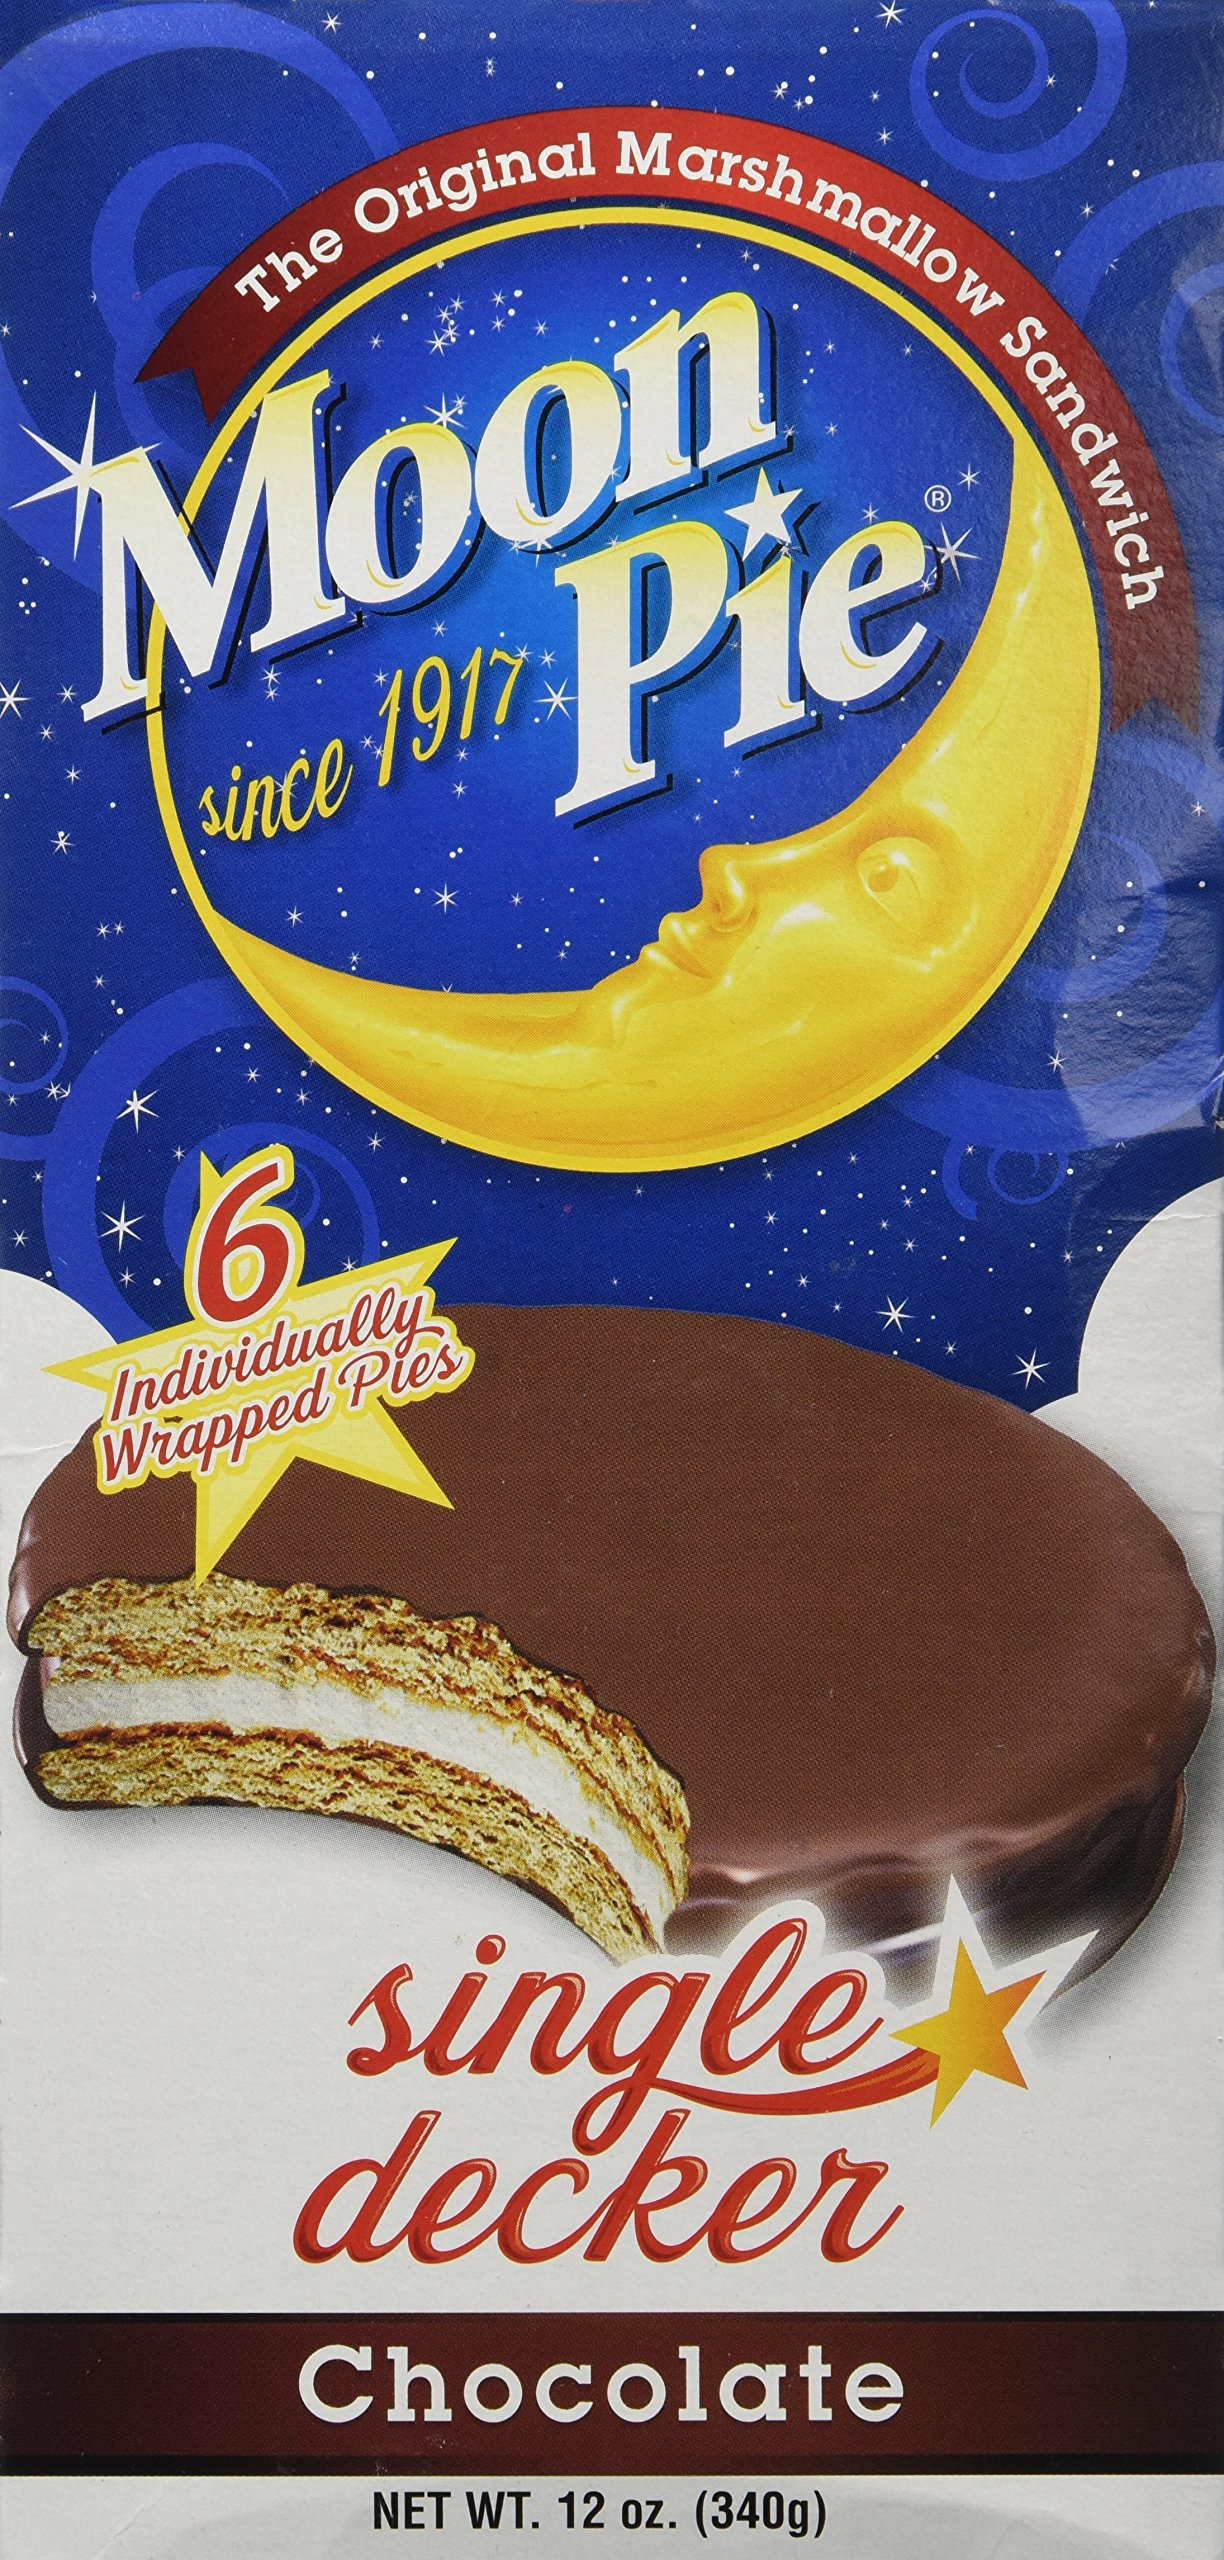 Moon Pie Original Marshmallow Sandwich Cookie by MoonPie